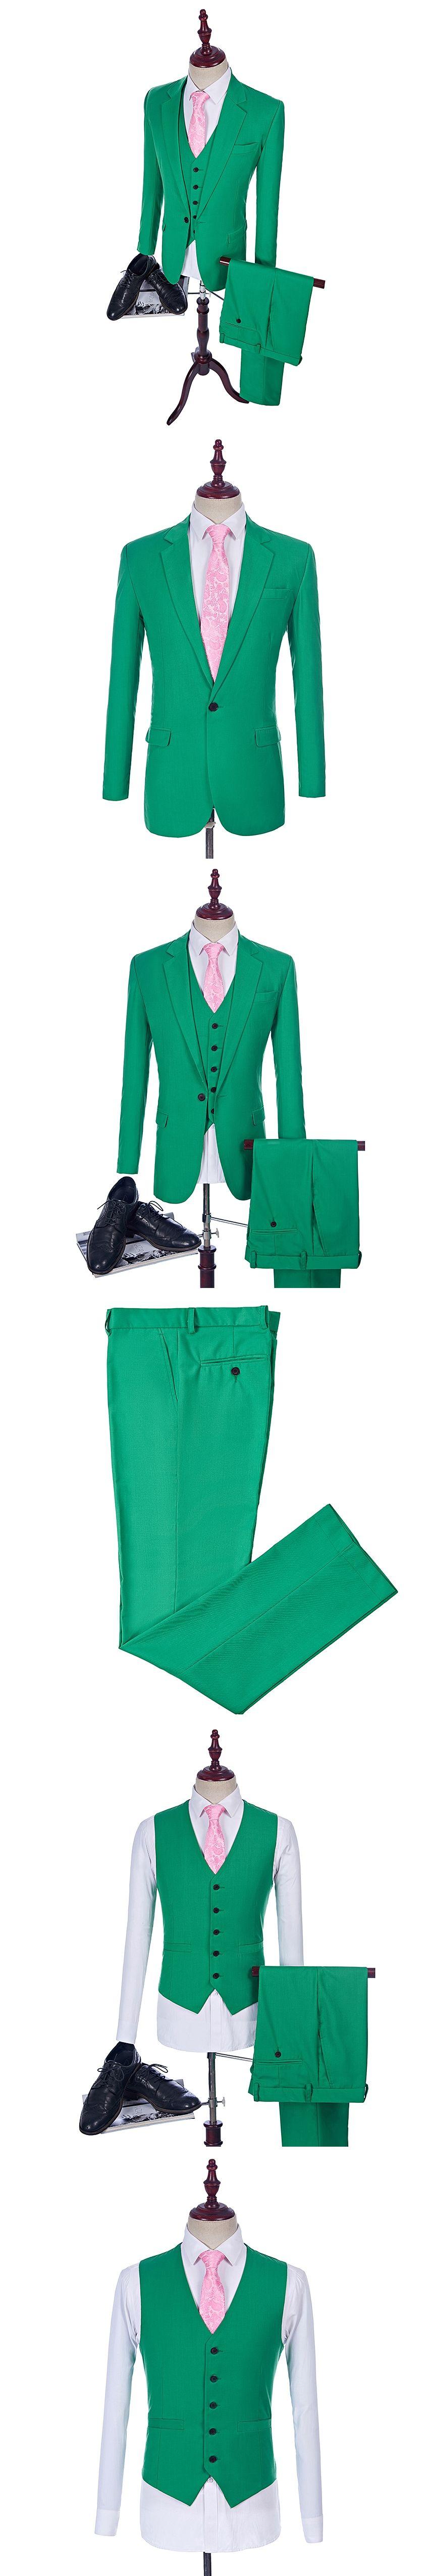 HB013 Aliexpress Green Wedding Tuxedo Custom Made Man Suits As Groom ...